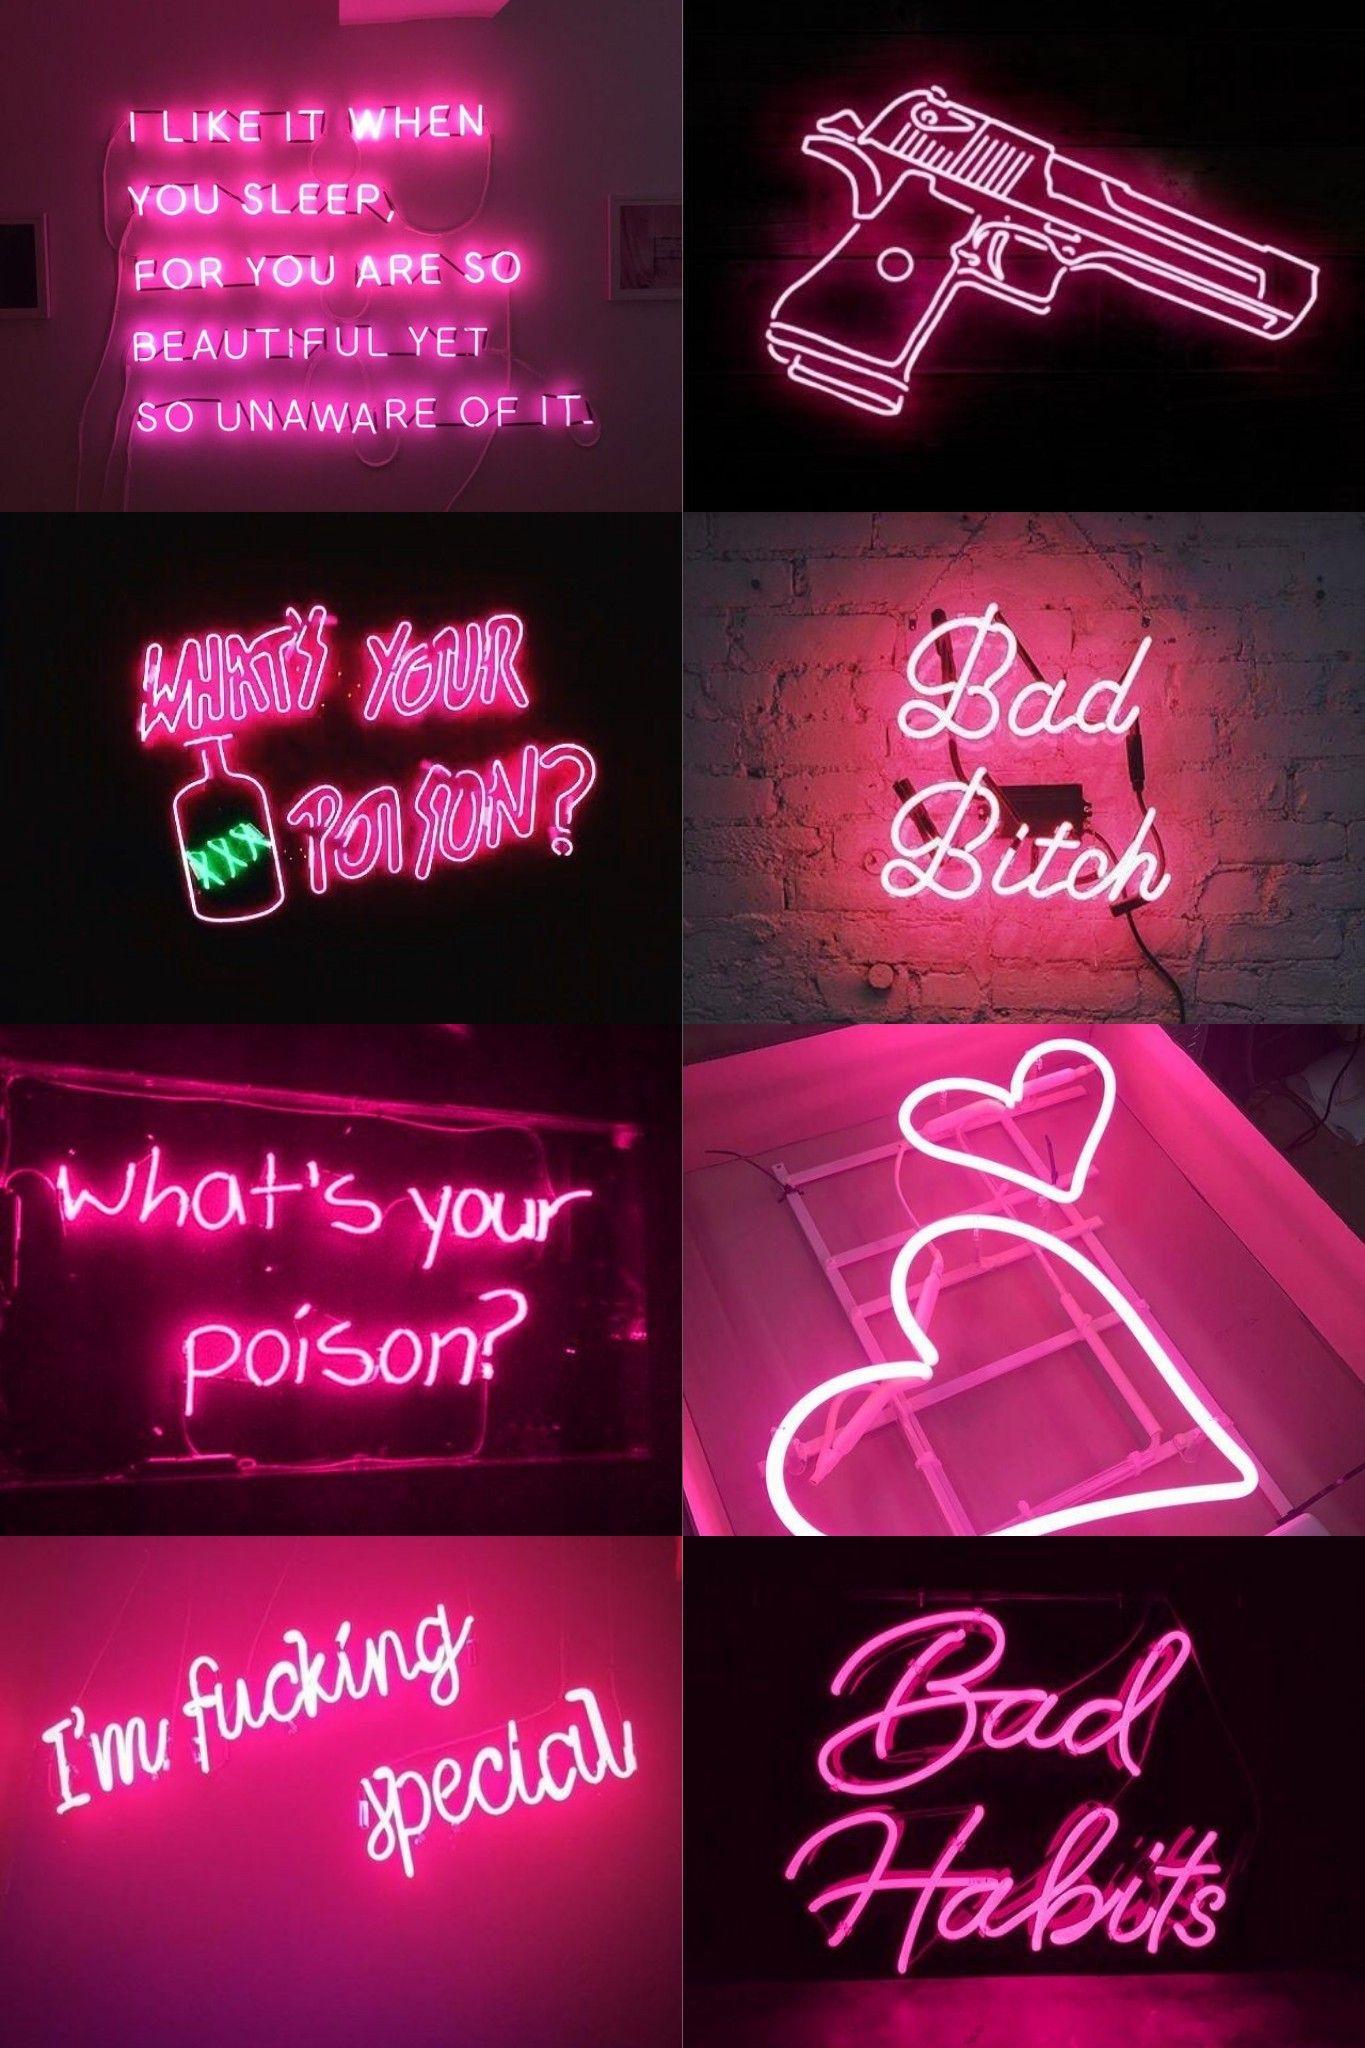 Neon Pink Aesthetic Wallpaper Aesthetic Iphone Wallpaper Pink Neon Wallpaper Pretty Wallpaper Iphone